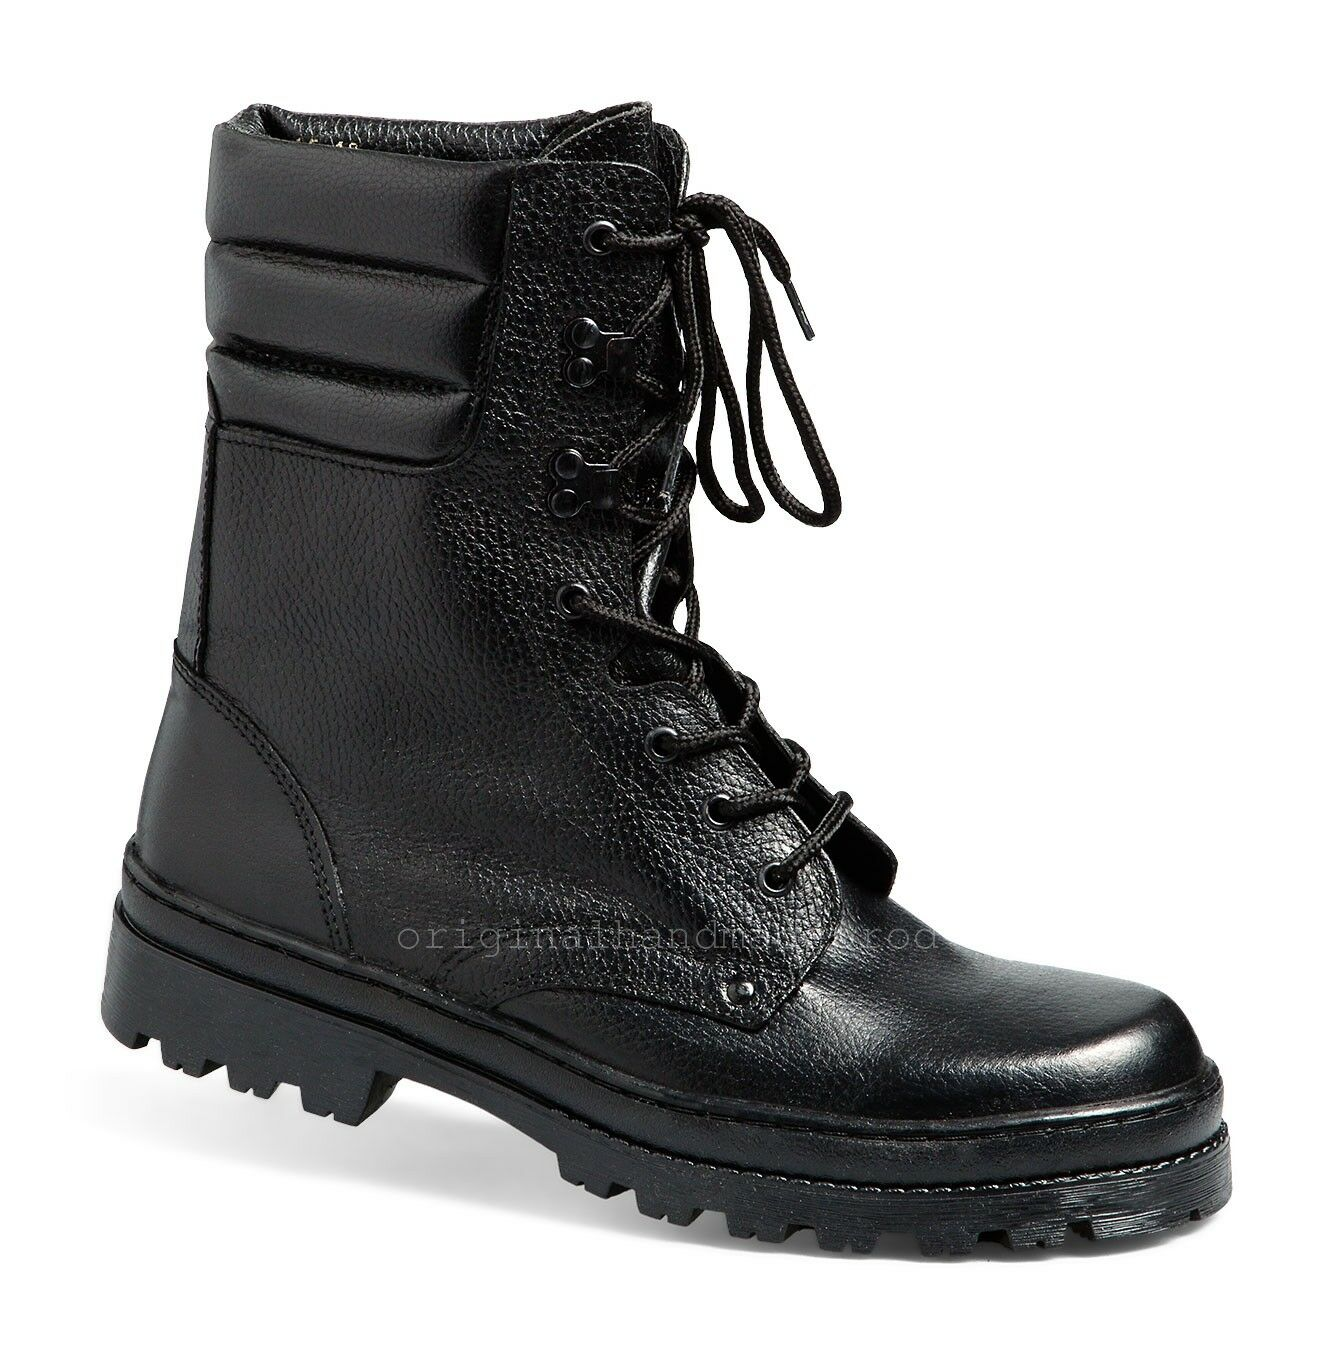 Russisch Armee Uniform Kampfstiefel Leder Stiefel Schuhe Militär Soldaten Jagd